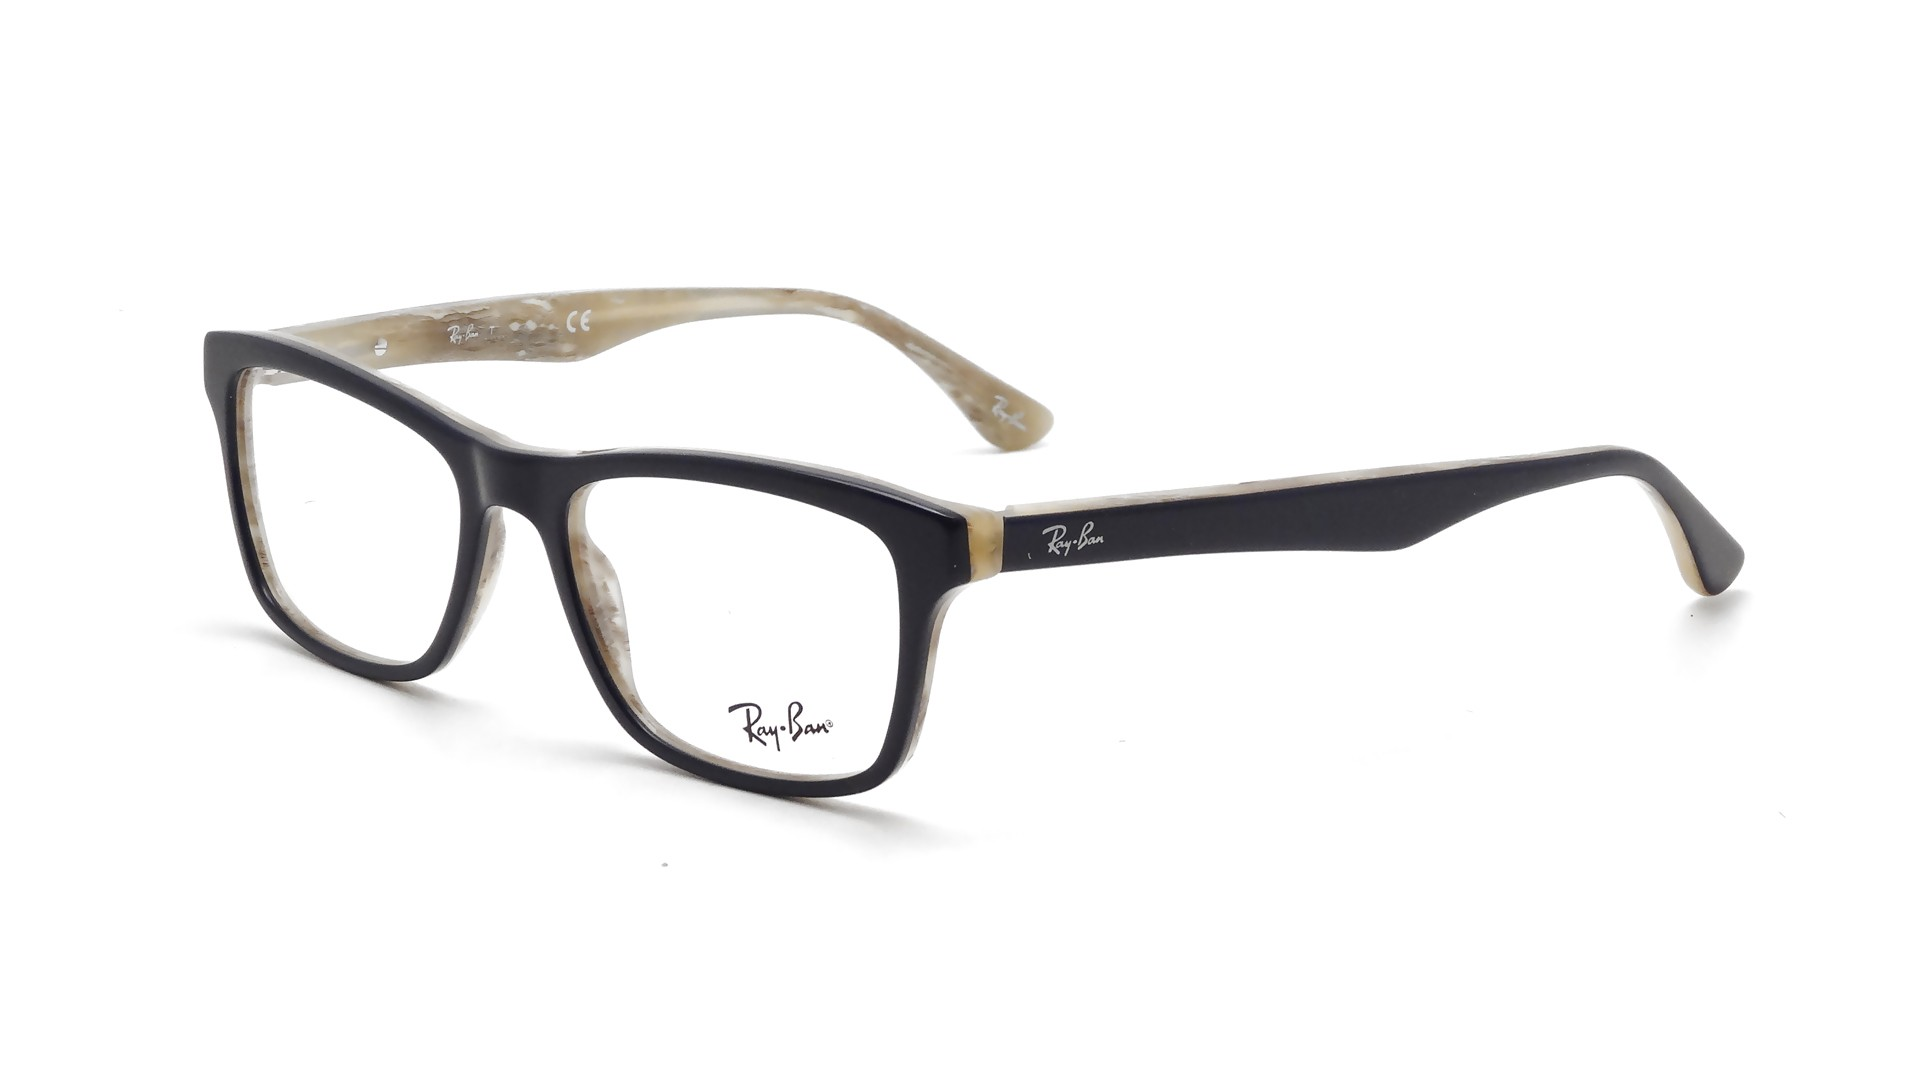 Ray Ban Glasses Frames Rx5279 : Ray-Ban RX5279 RB5279 5131 53-18 Blue Visiofactory